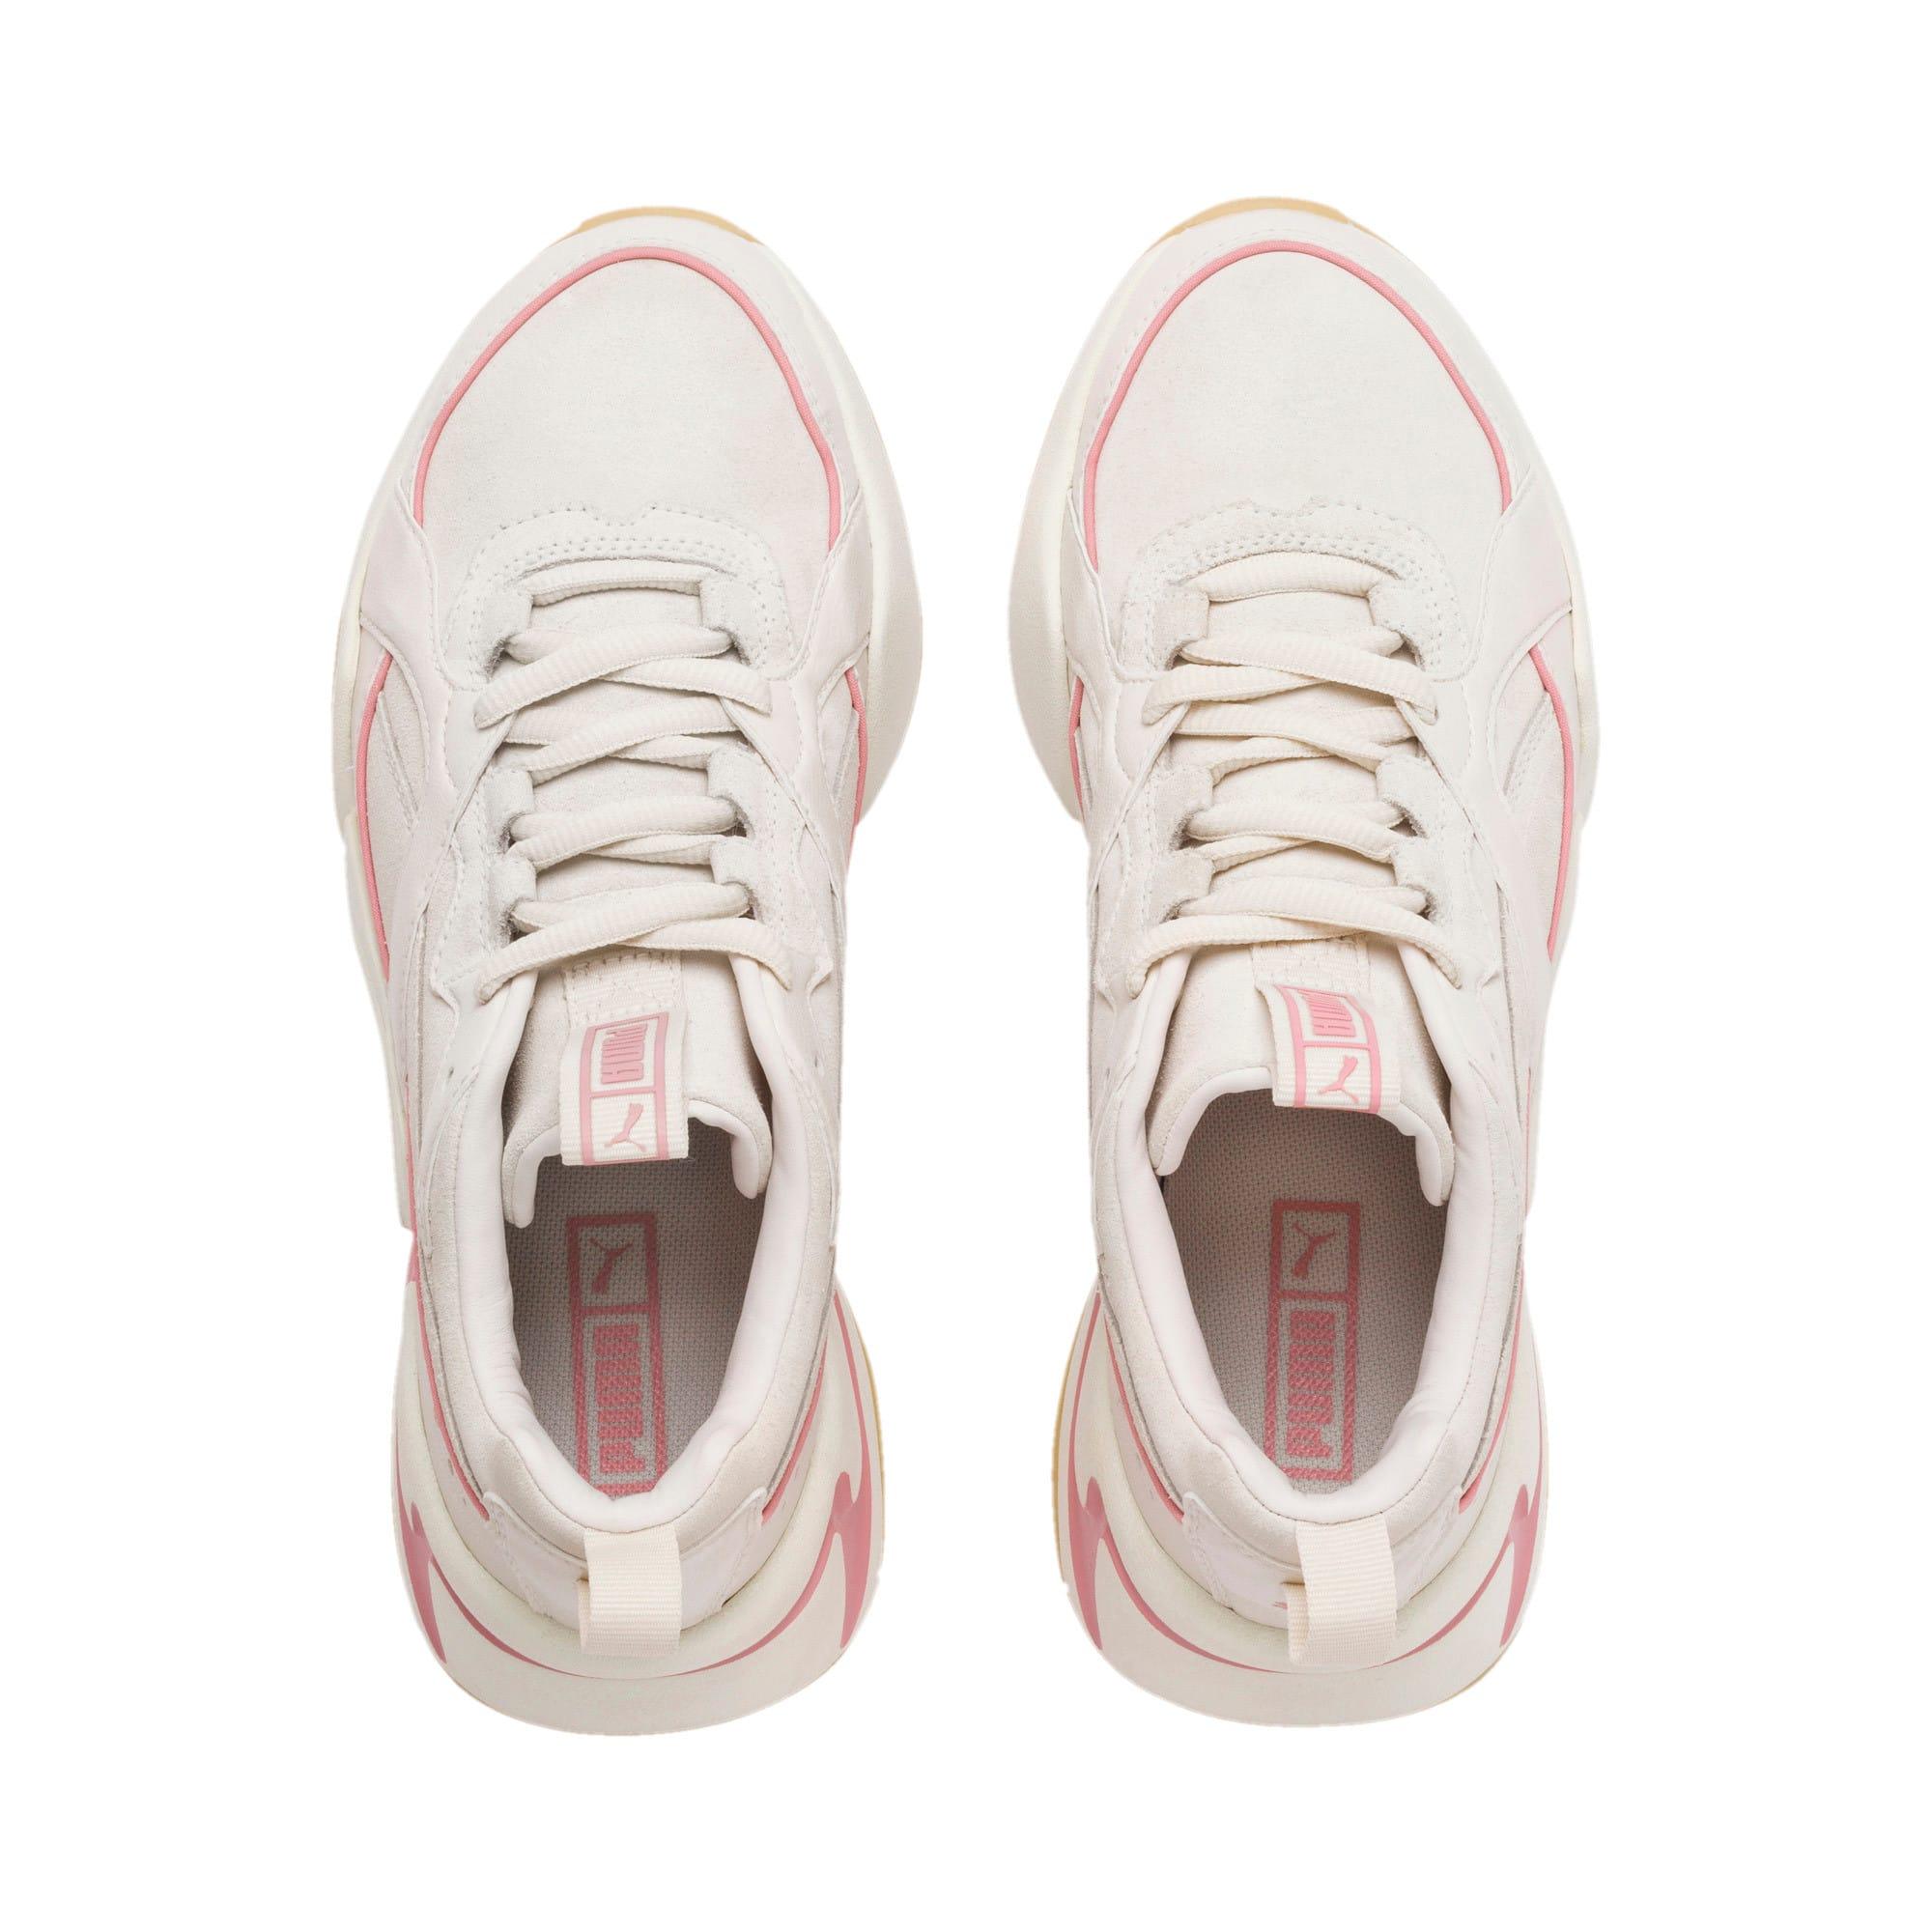 Thumbnail 7 of Nova 2 Suede Women's Sneakers, Pastel Parchment-Whisp White, medium